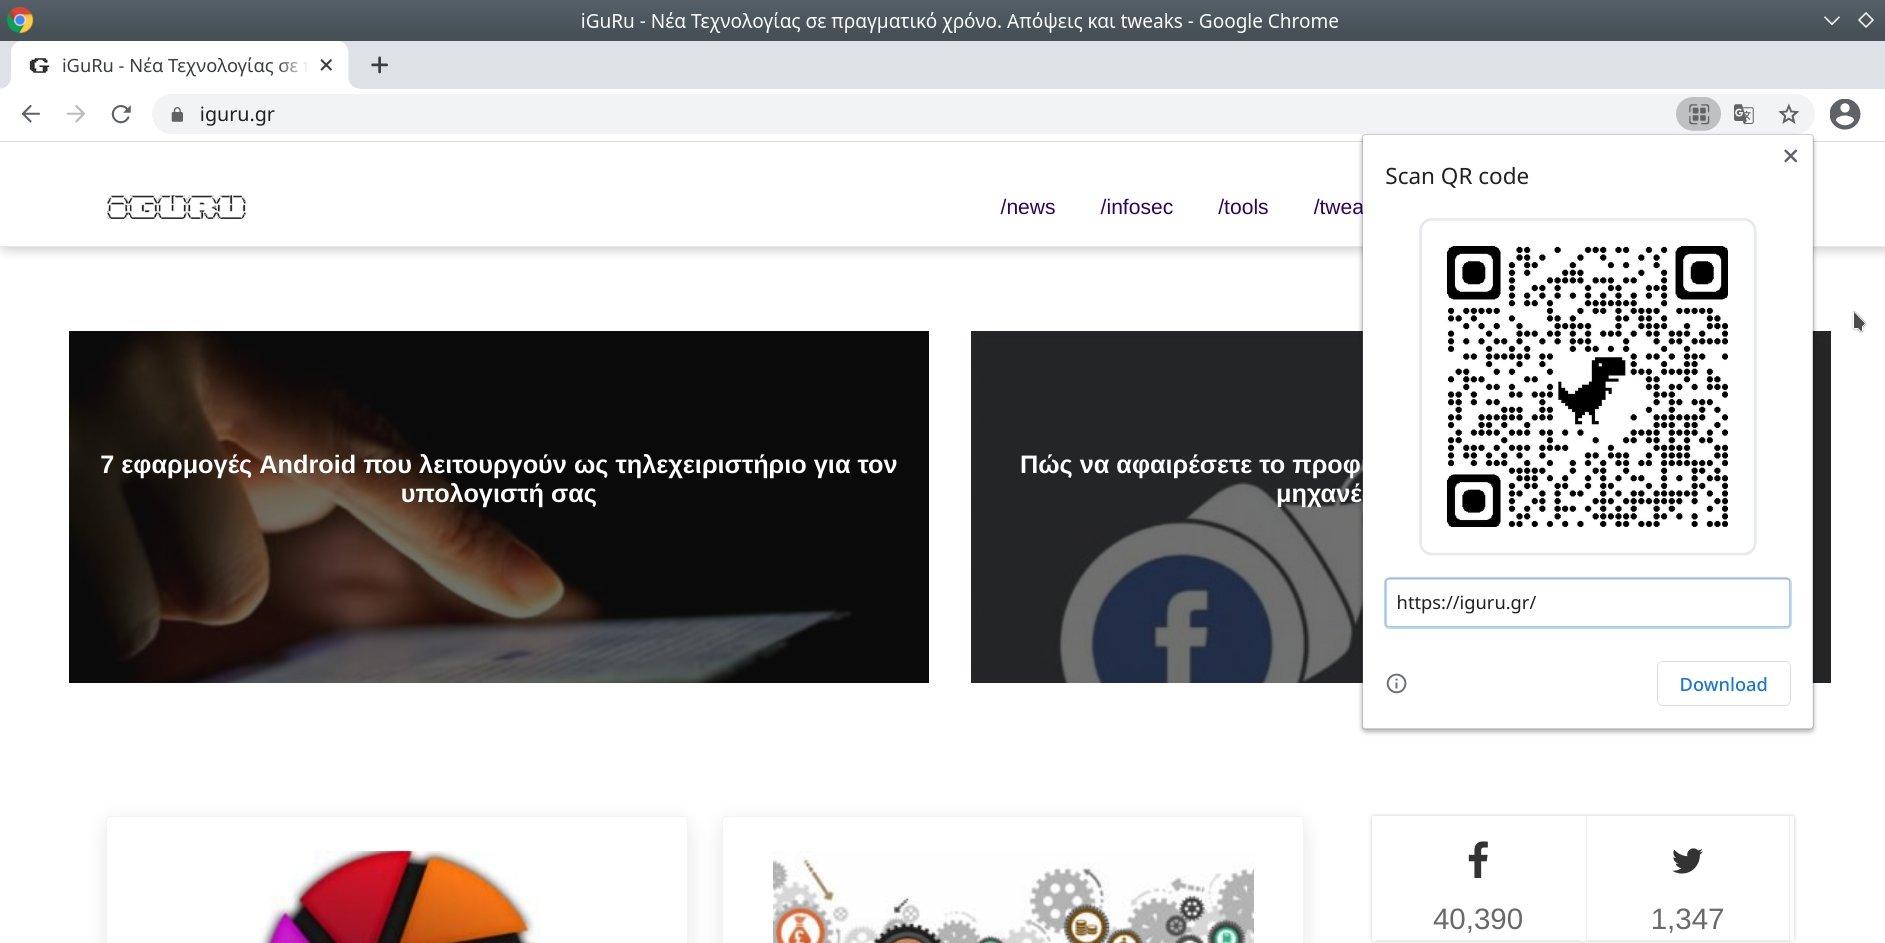 qr chrome - Chrome 88 μοιραστείτε σελίδες με QR Code